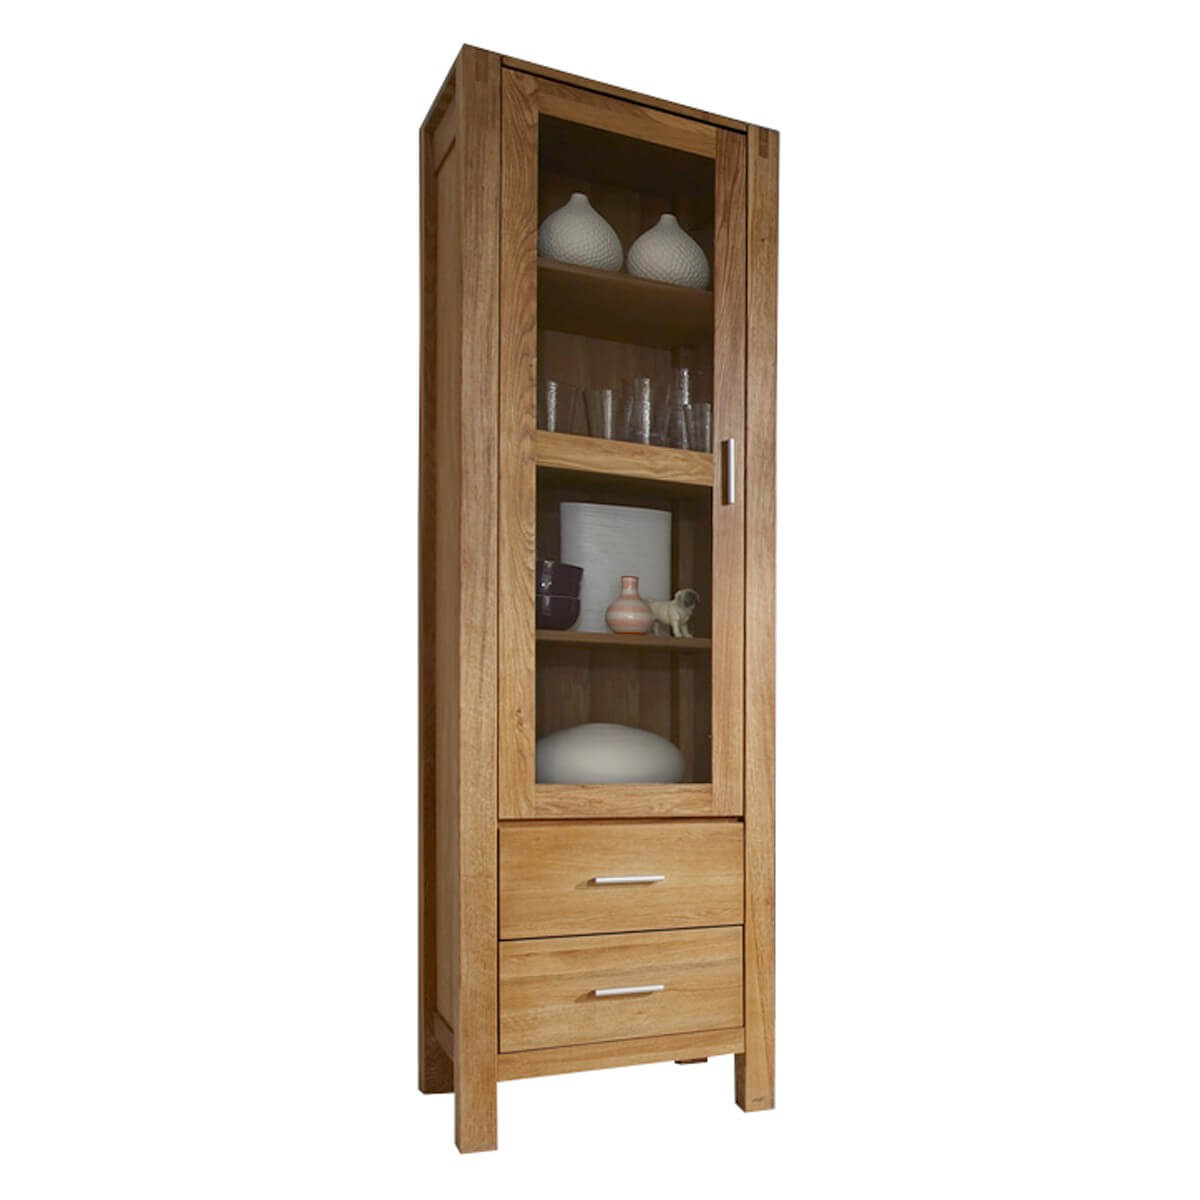 vitrine holzvitrine standvitrine vitrinenschrank holz eiche natur ge lt neu ebay. Black Bedroom Furniture Sets. Home Design Ideas